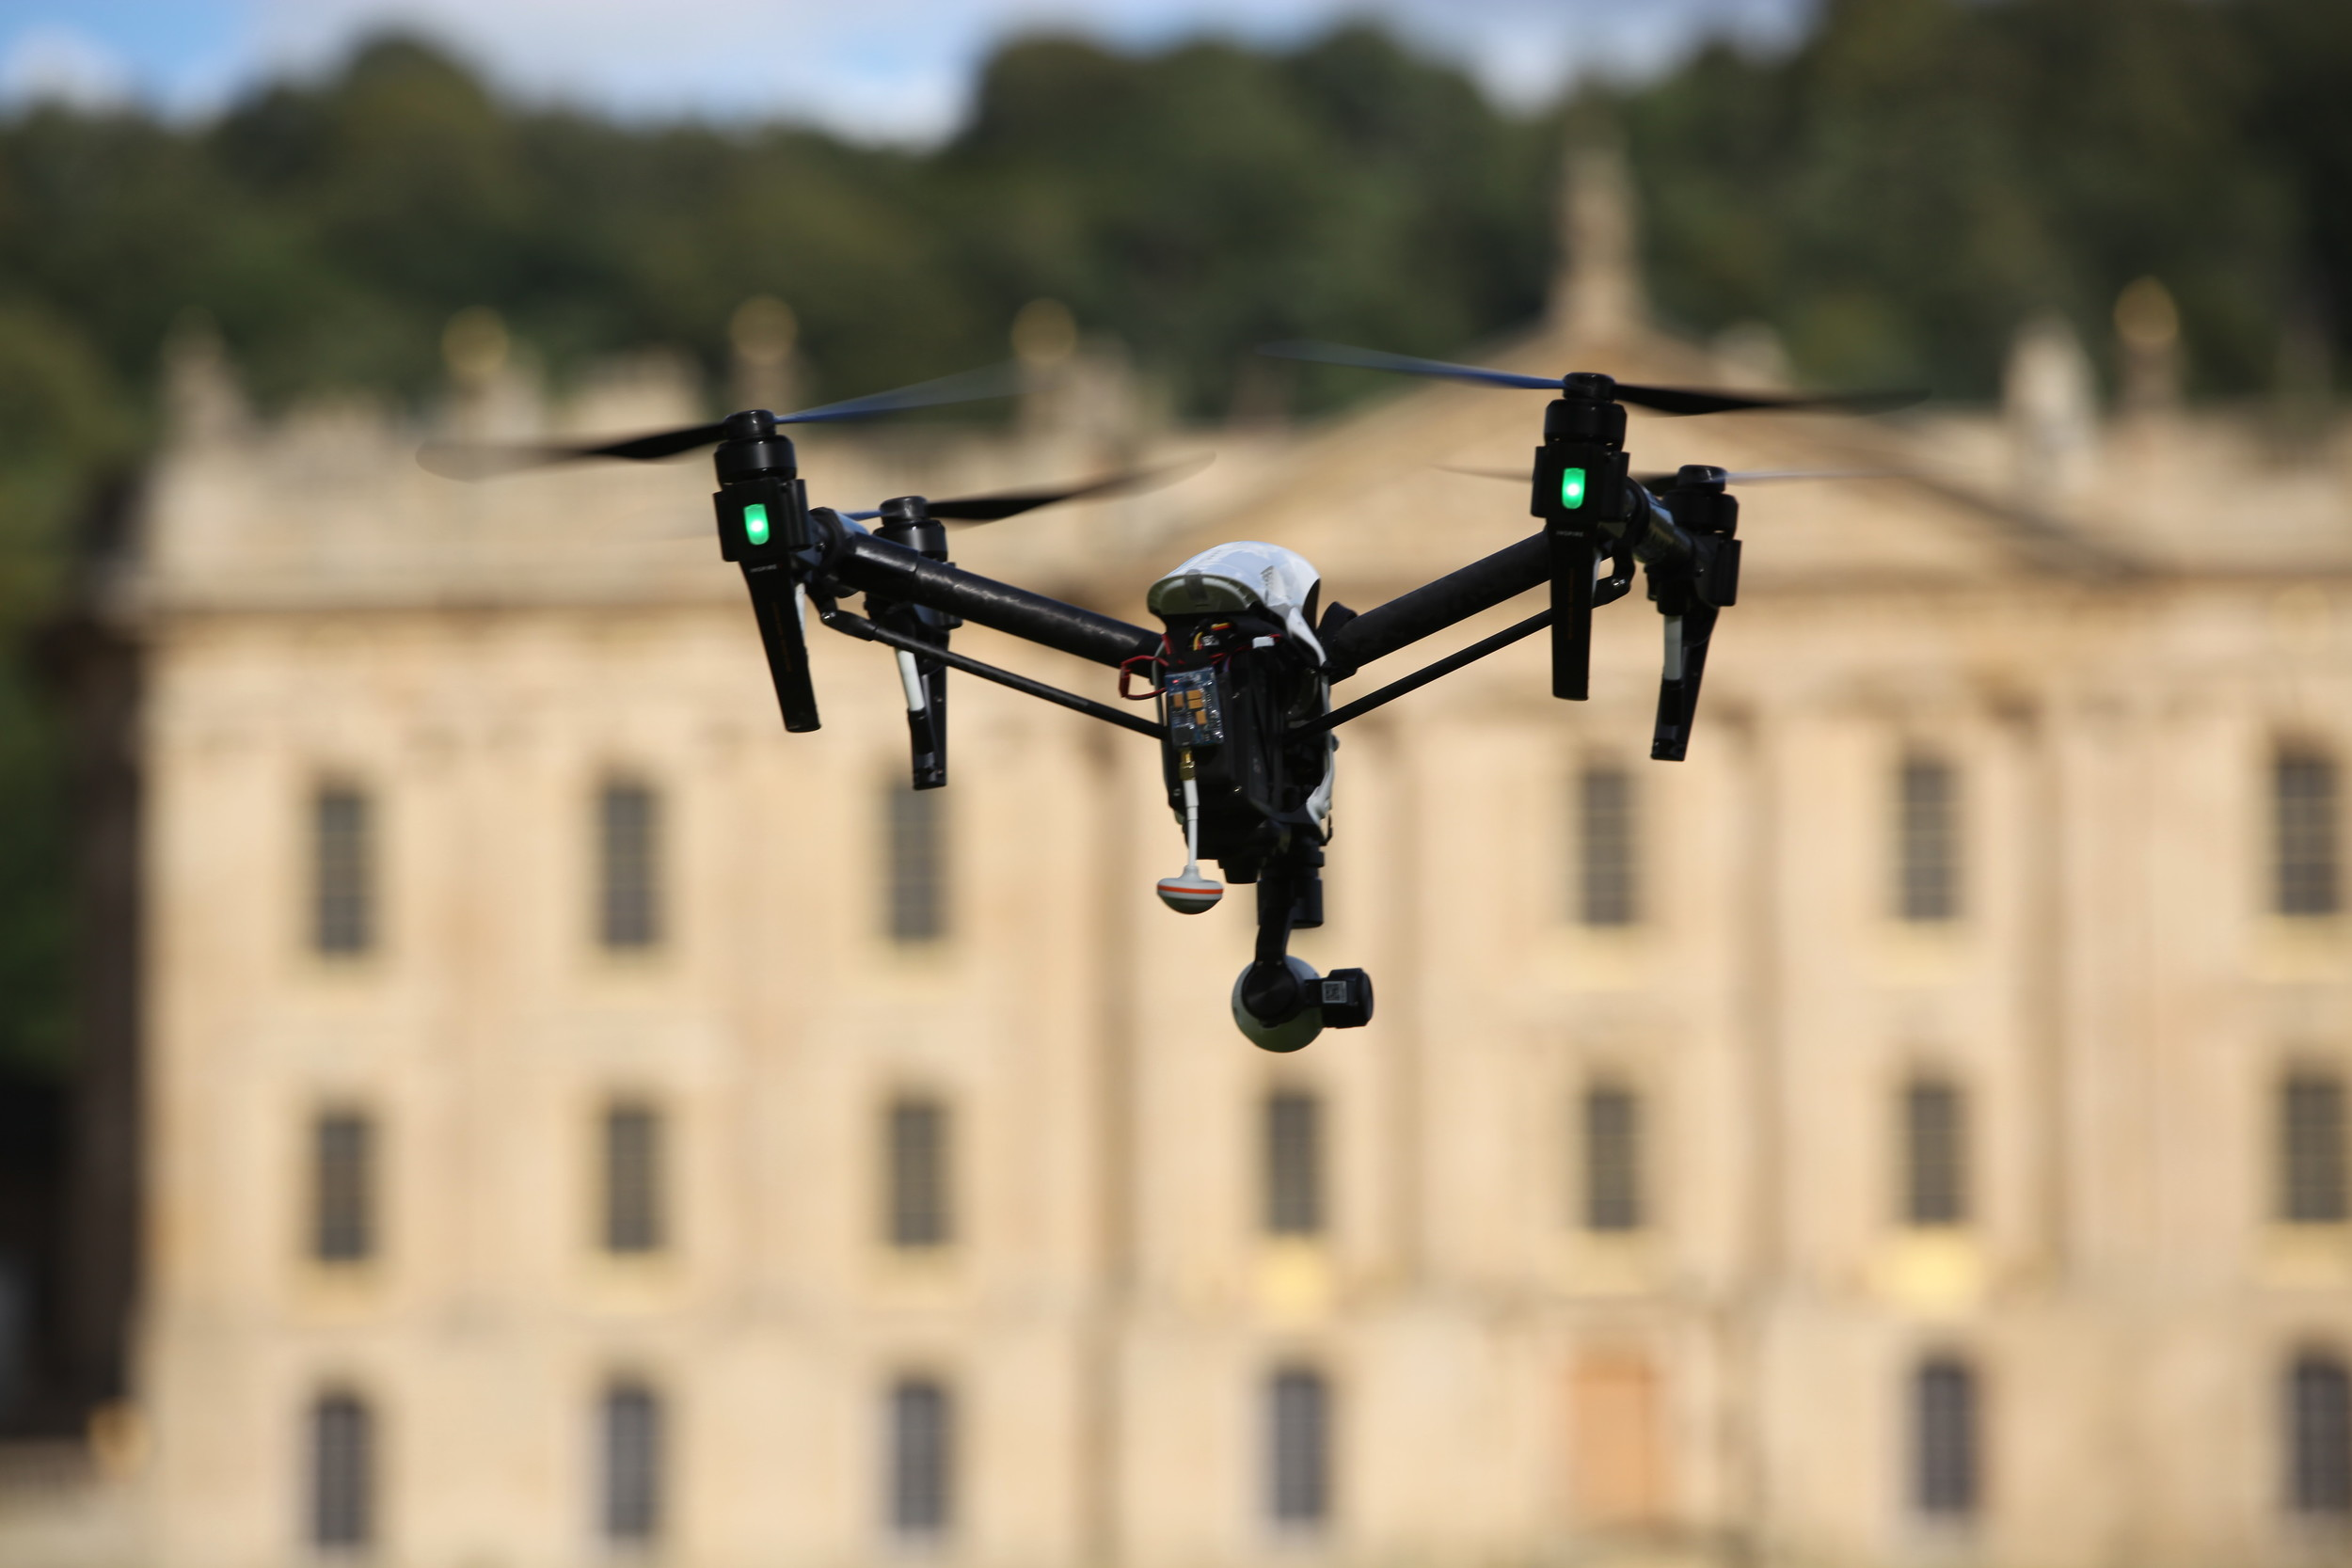 Pro bono aerial filming at Chatsworth